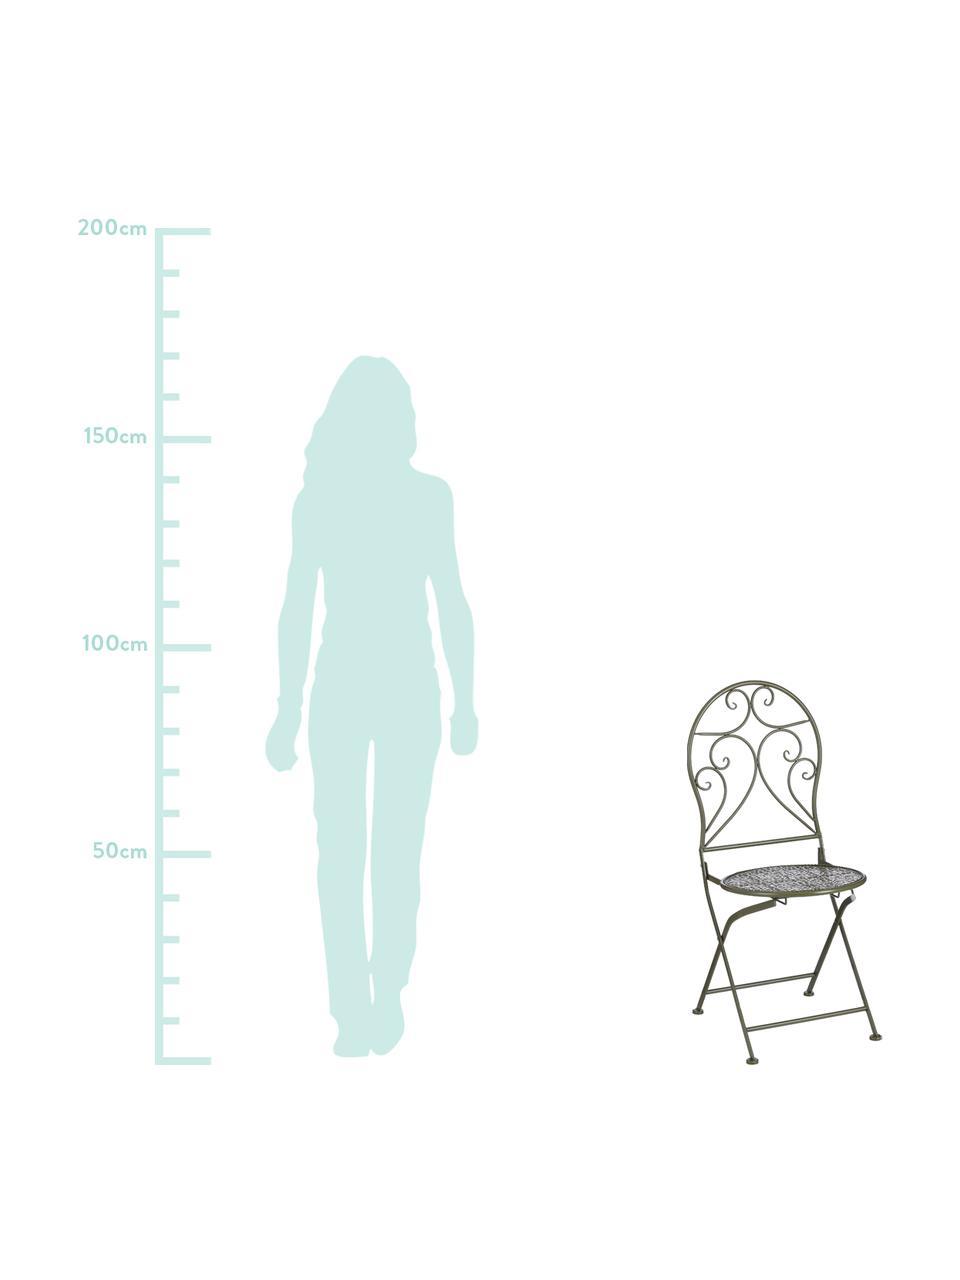 Klappbare Balkonstühle Ninet, 2 Stück, Metall, beschichtet, Grün, 40 x 92 cm